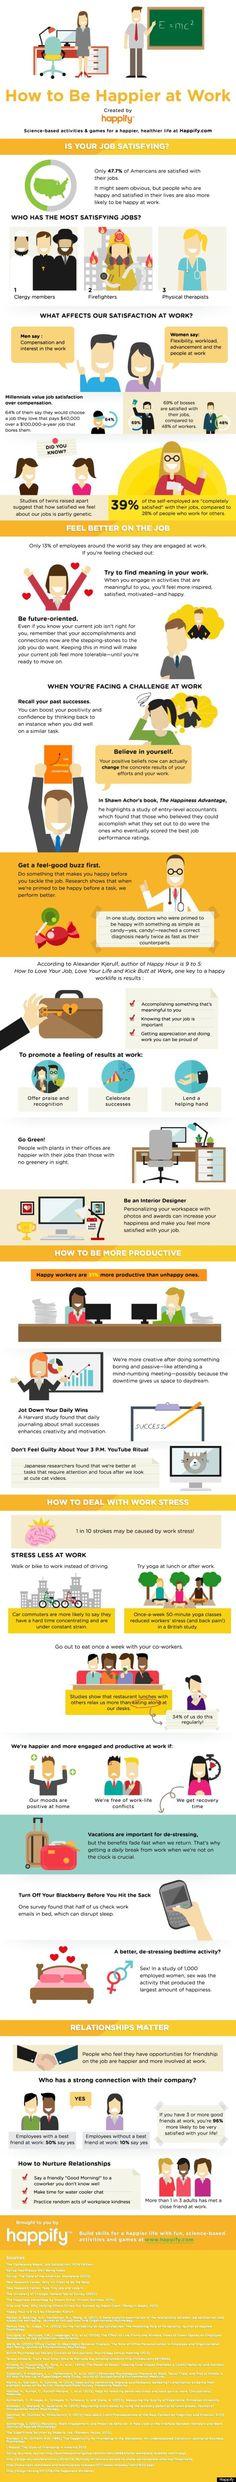 Tips & tricks for feeling happier at work